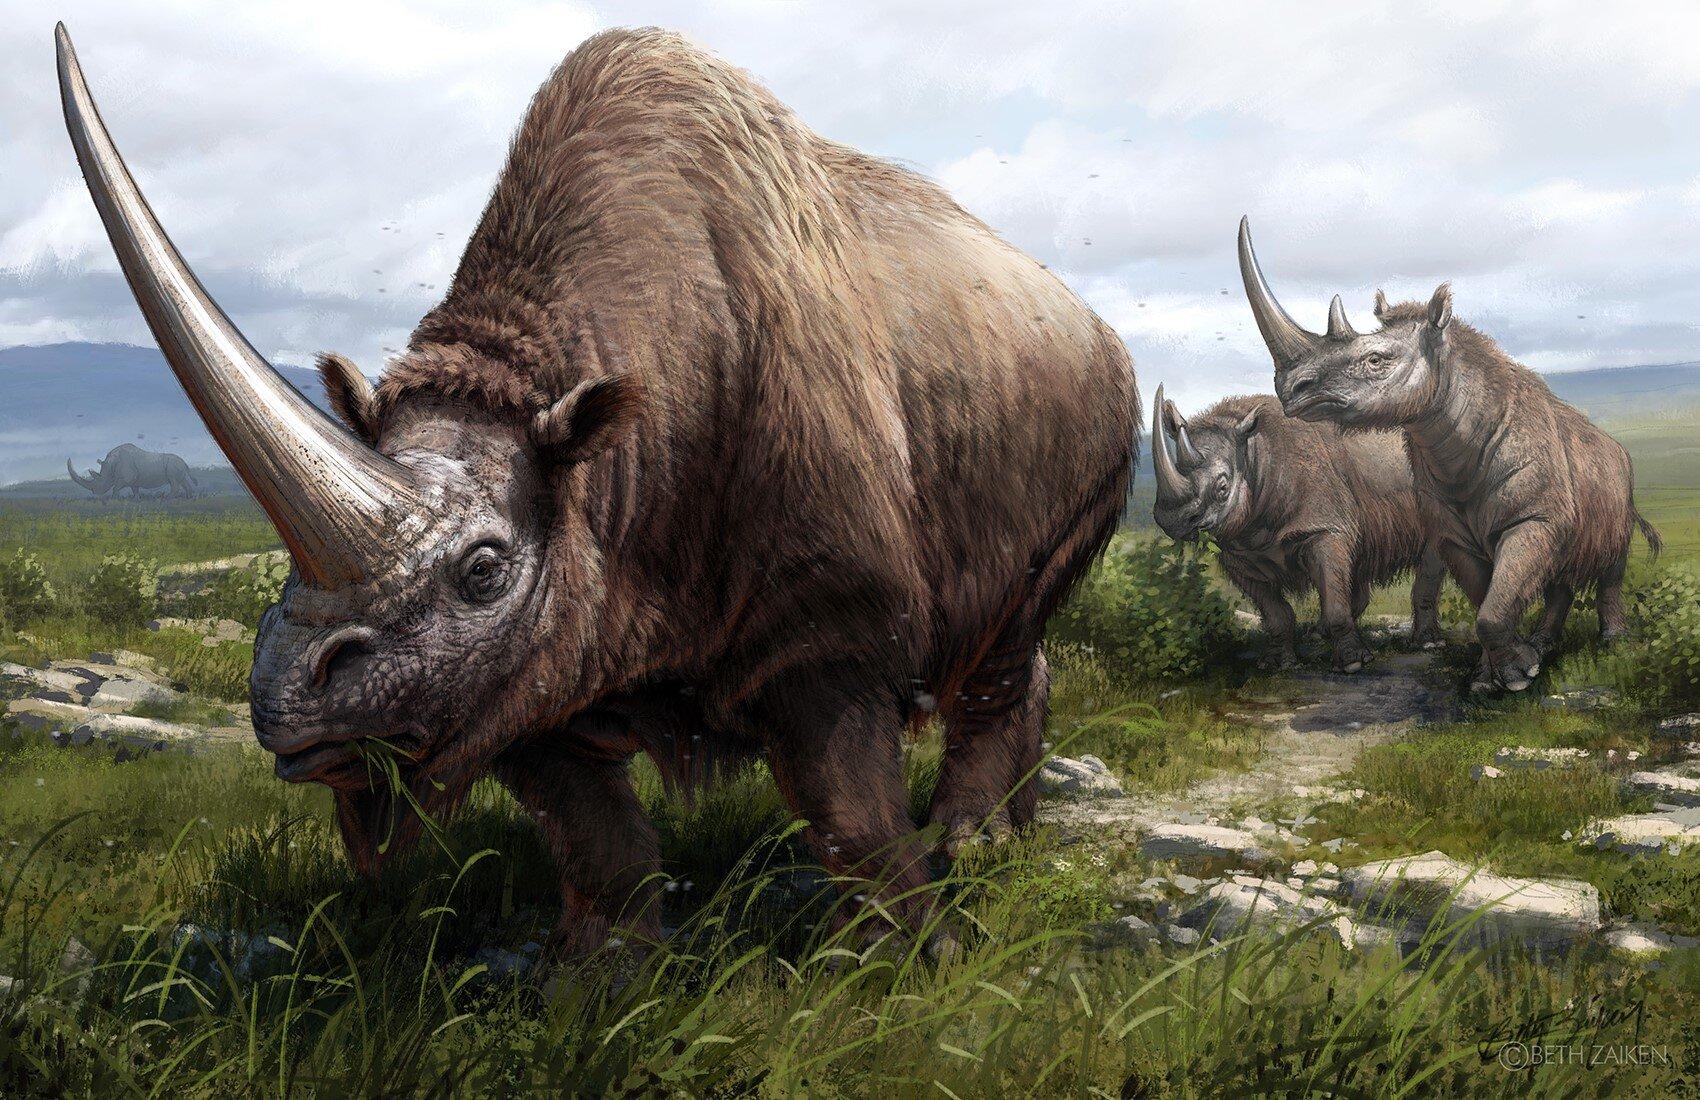 Geneticists map the rhinoceros family tree